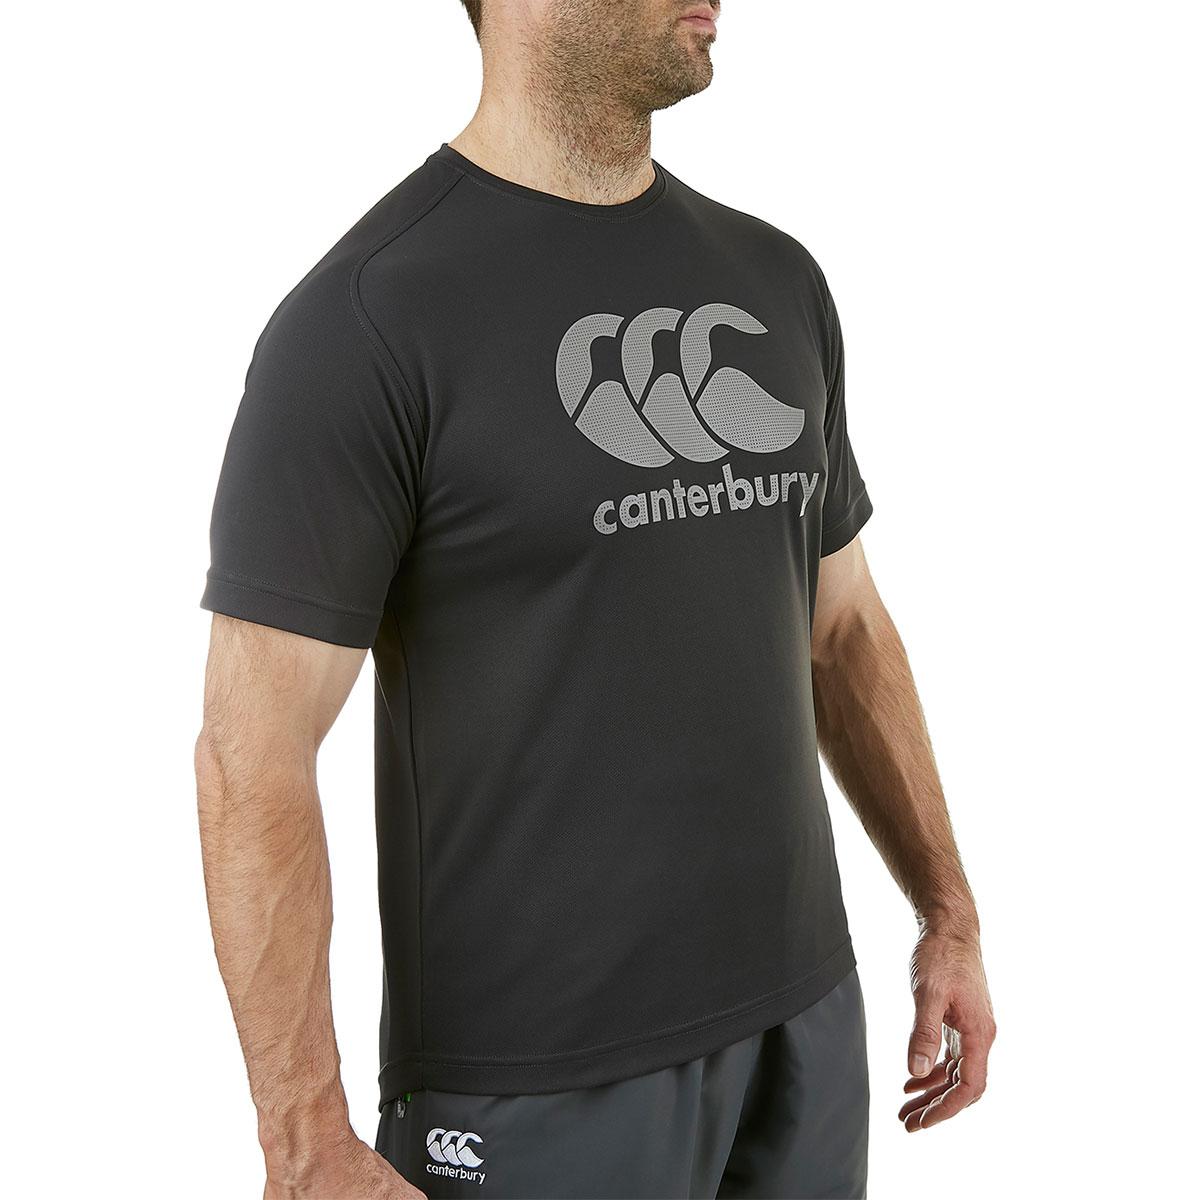 Canterbury-Para-hombre-Core-vapodri-Grande-logotipo-Quickdry-transpirable-T-Shirt miniatura 13